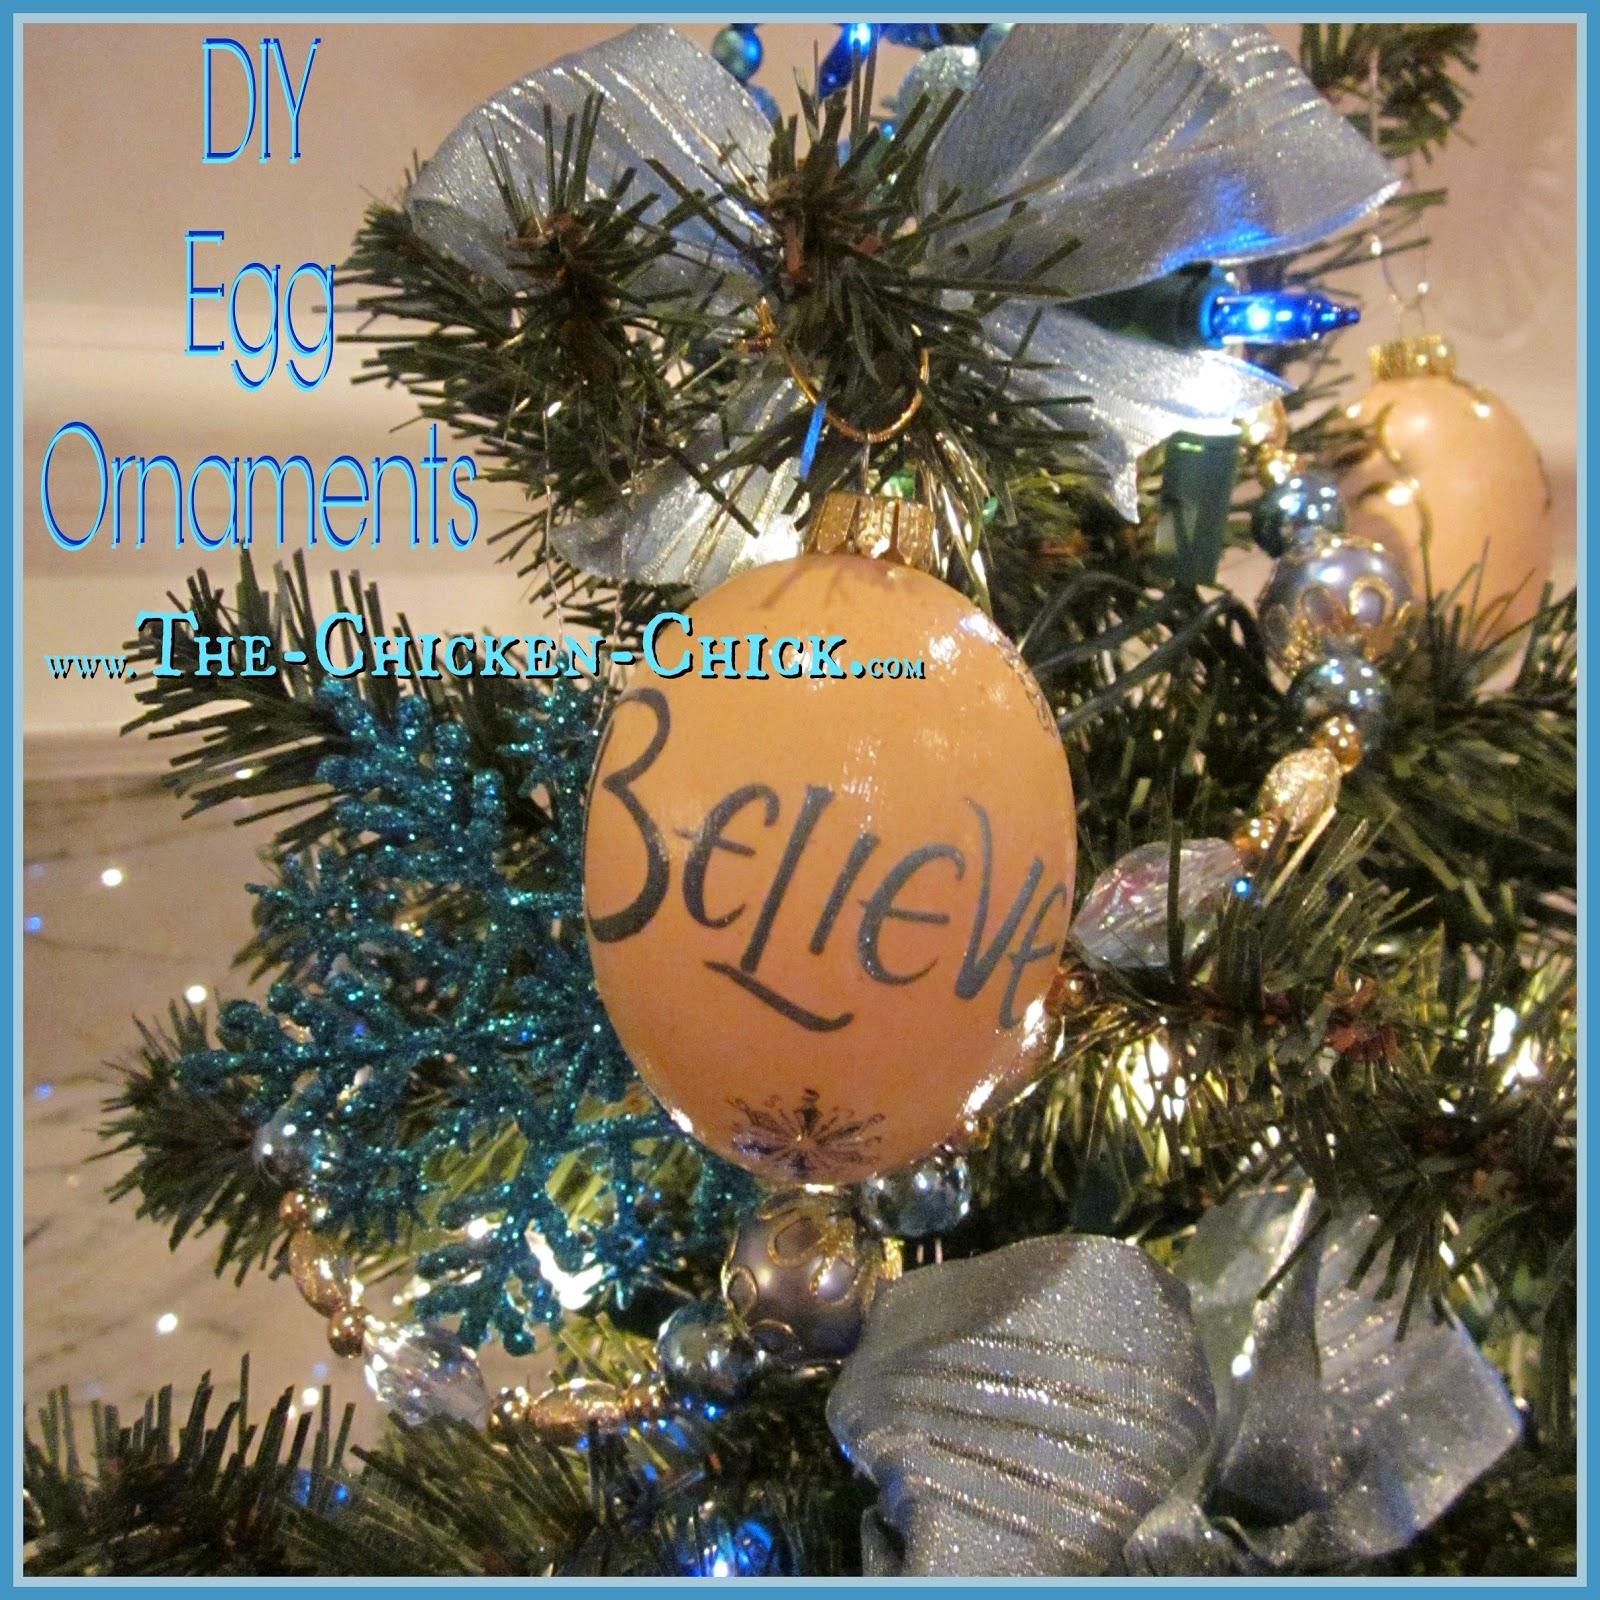 Diy Egg Ornaments Via The Chicken Chick®